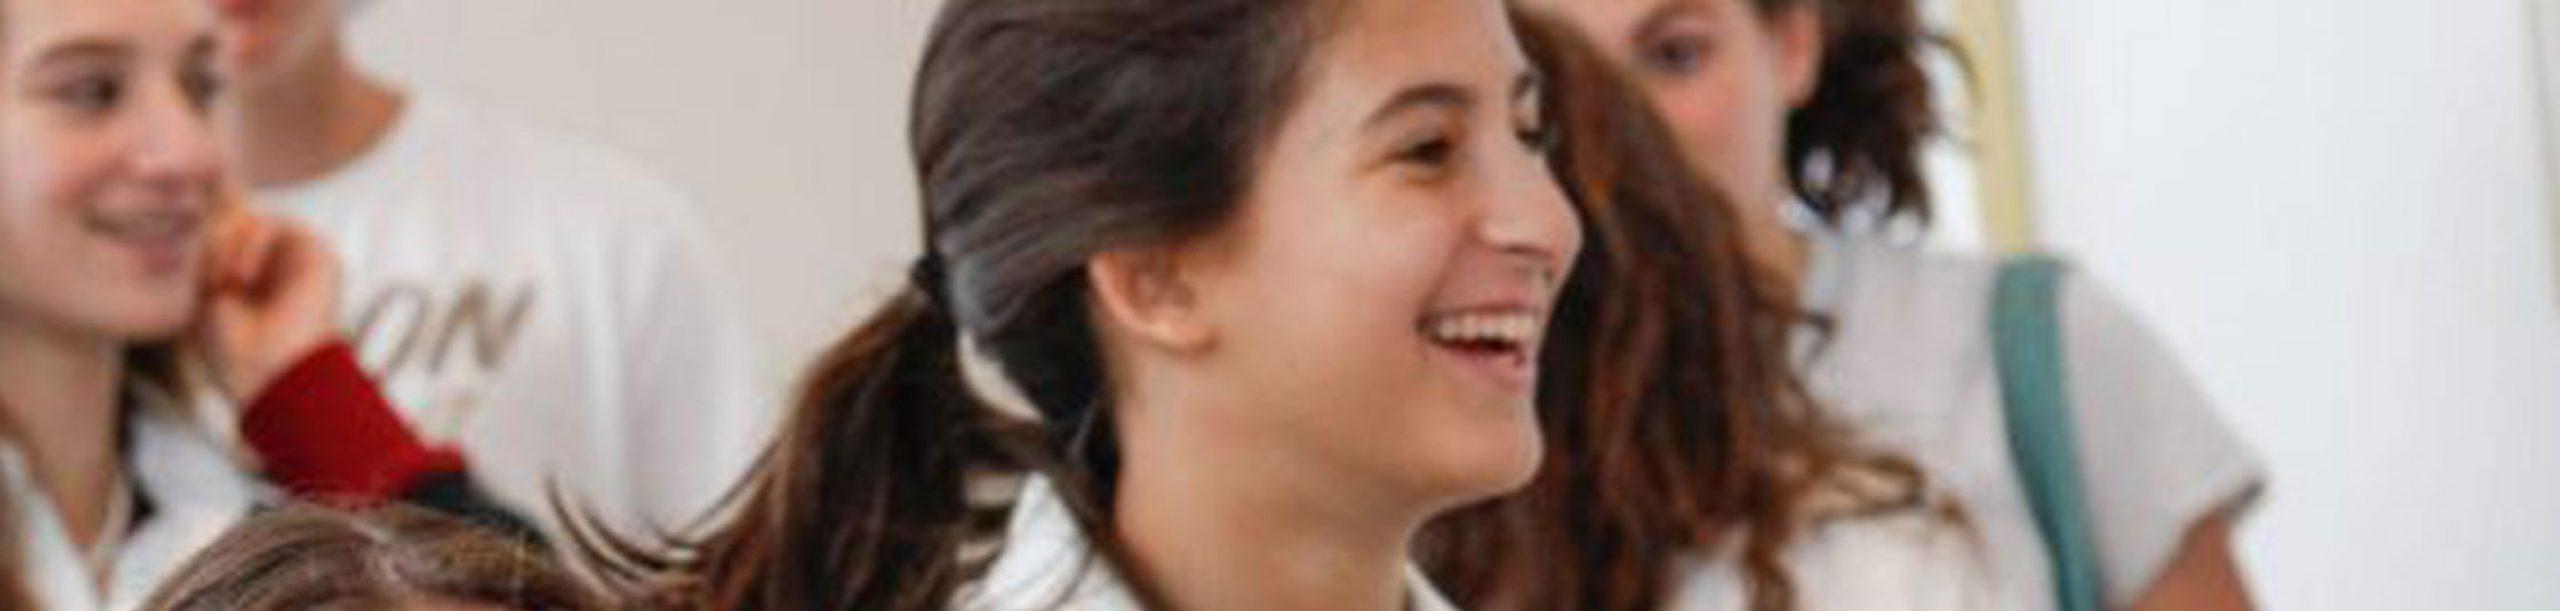 Prozdor-girl_smiling